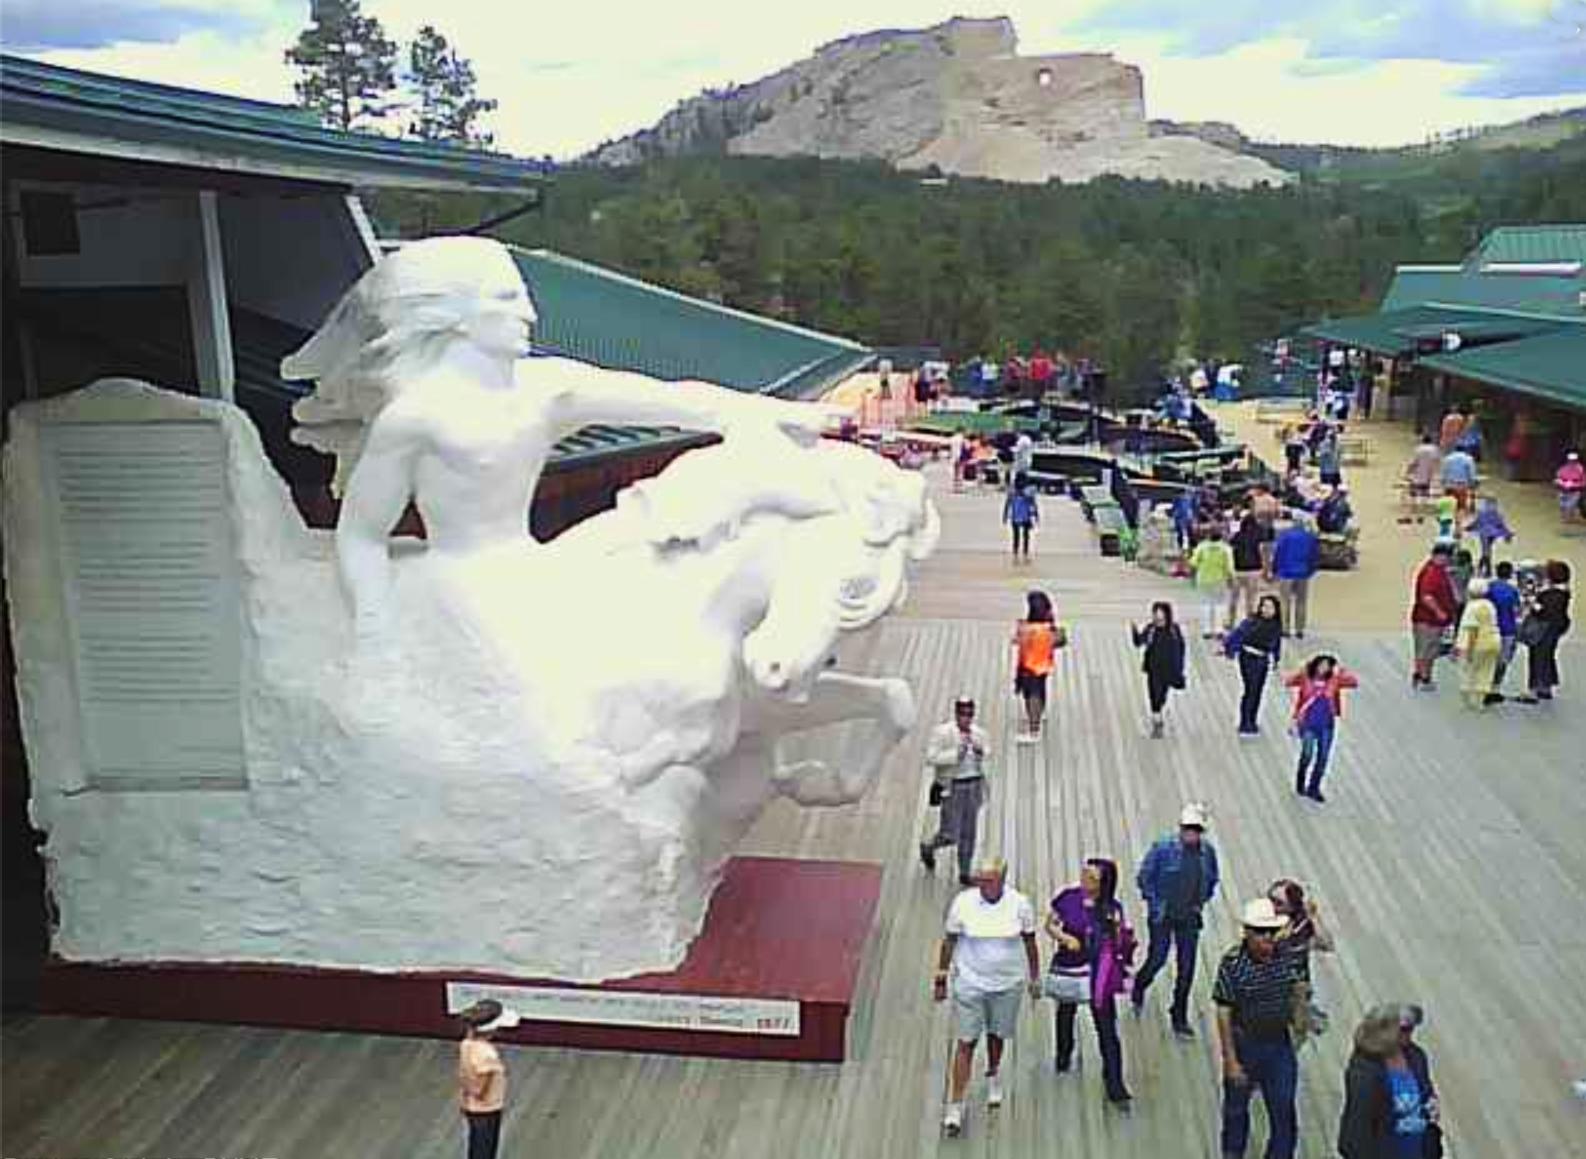 Crazy Horse Memorial Viewing Deck